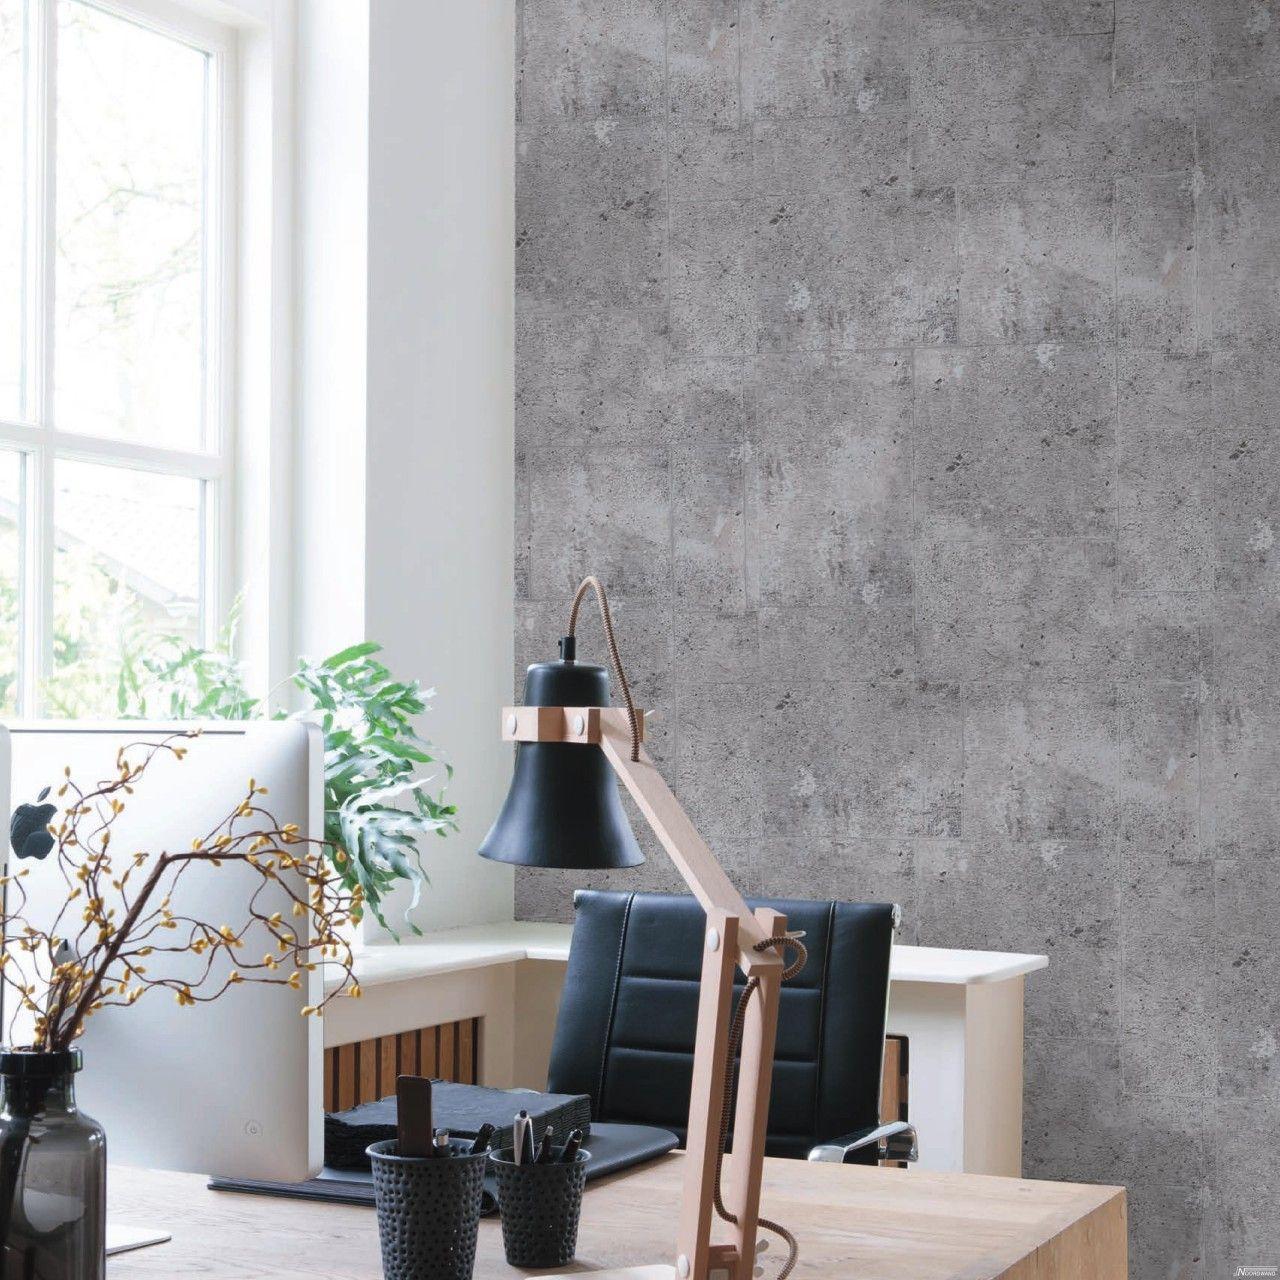 Vliestapete Beton Steinwand Grau In 2020